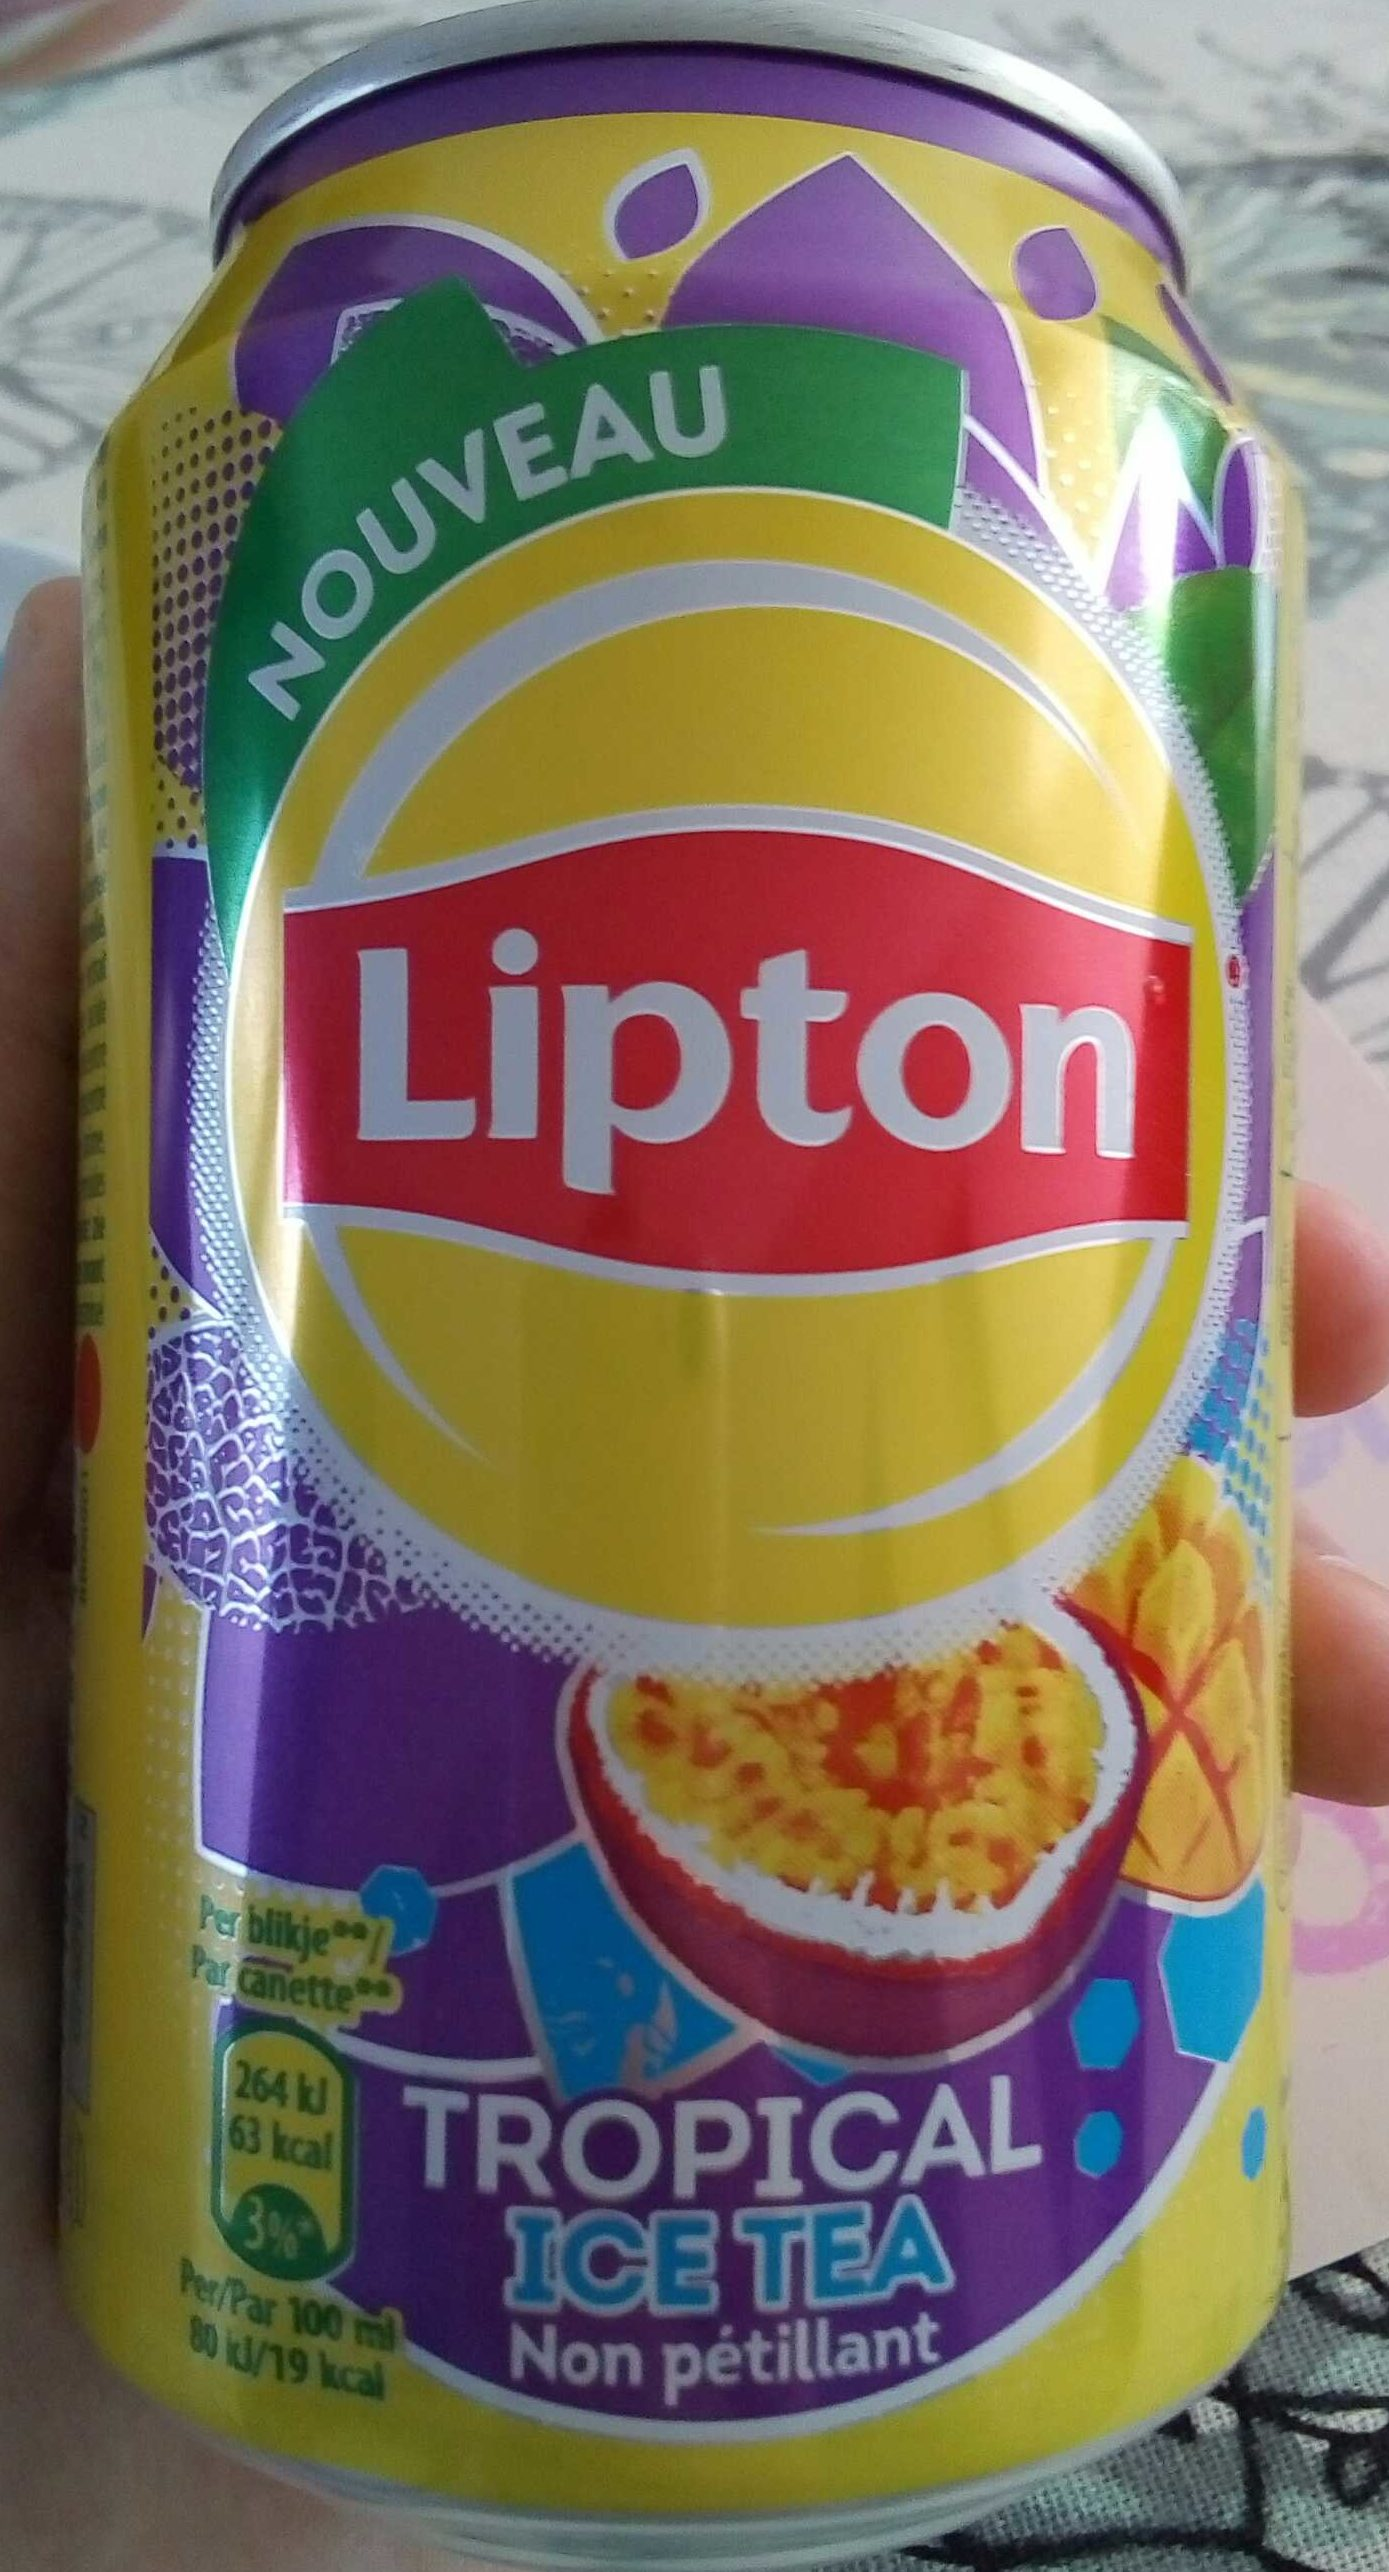 Lipton-ice Tea -tropical Fruit-330ml-belgium - Product